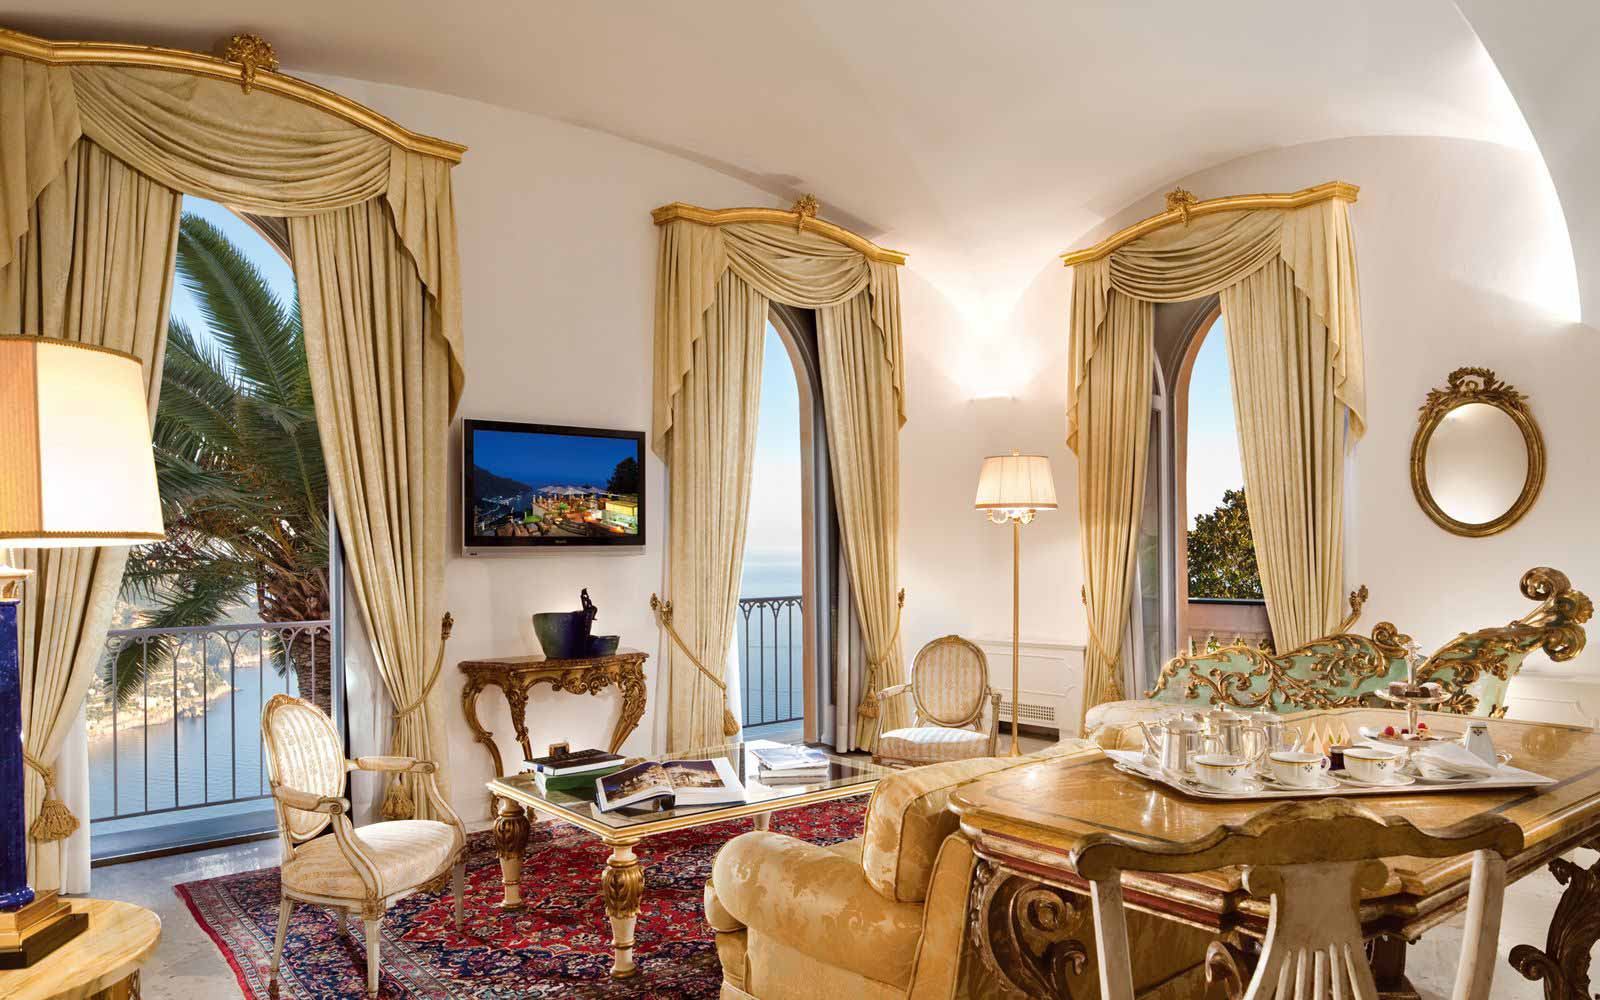 Orizzonte Suite at Palazzo Avino